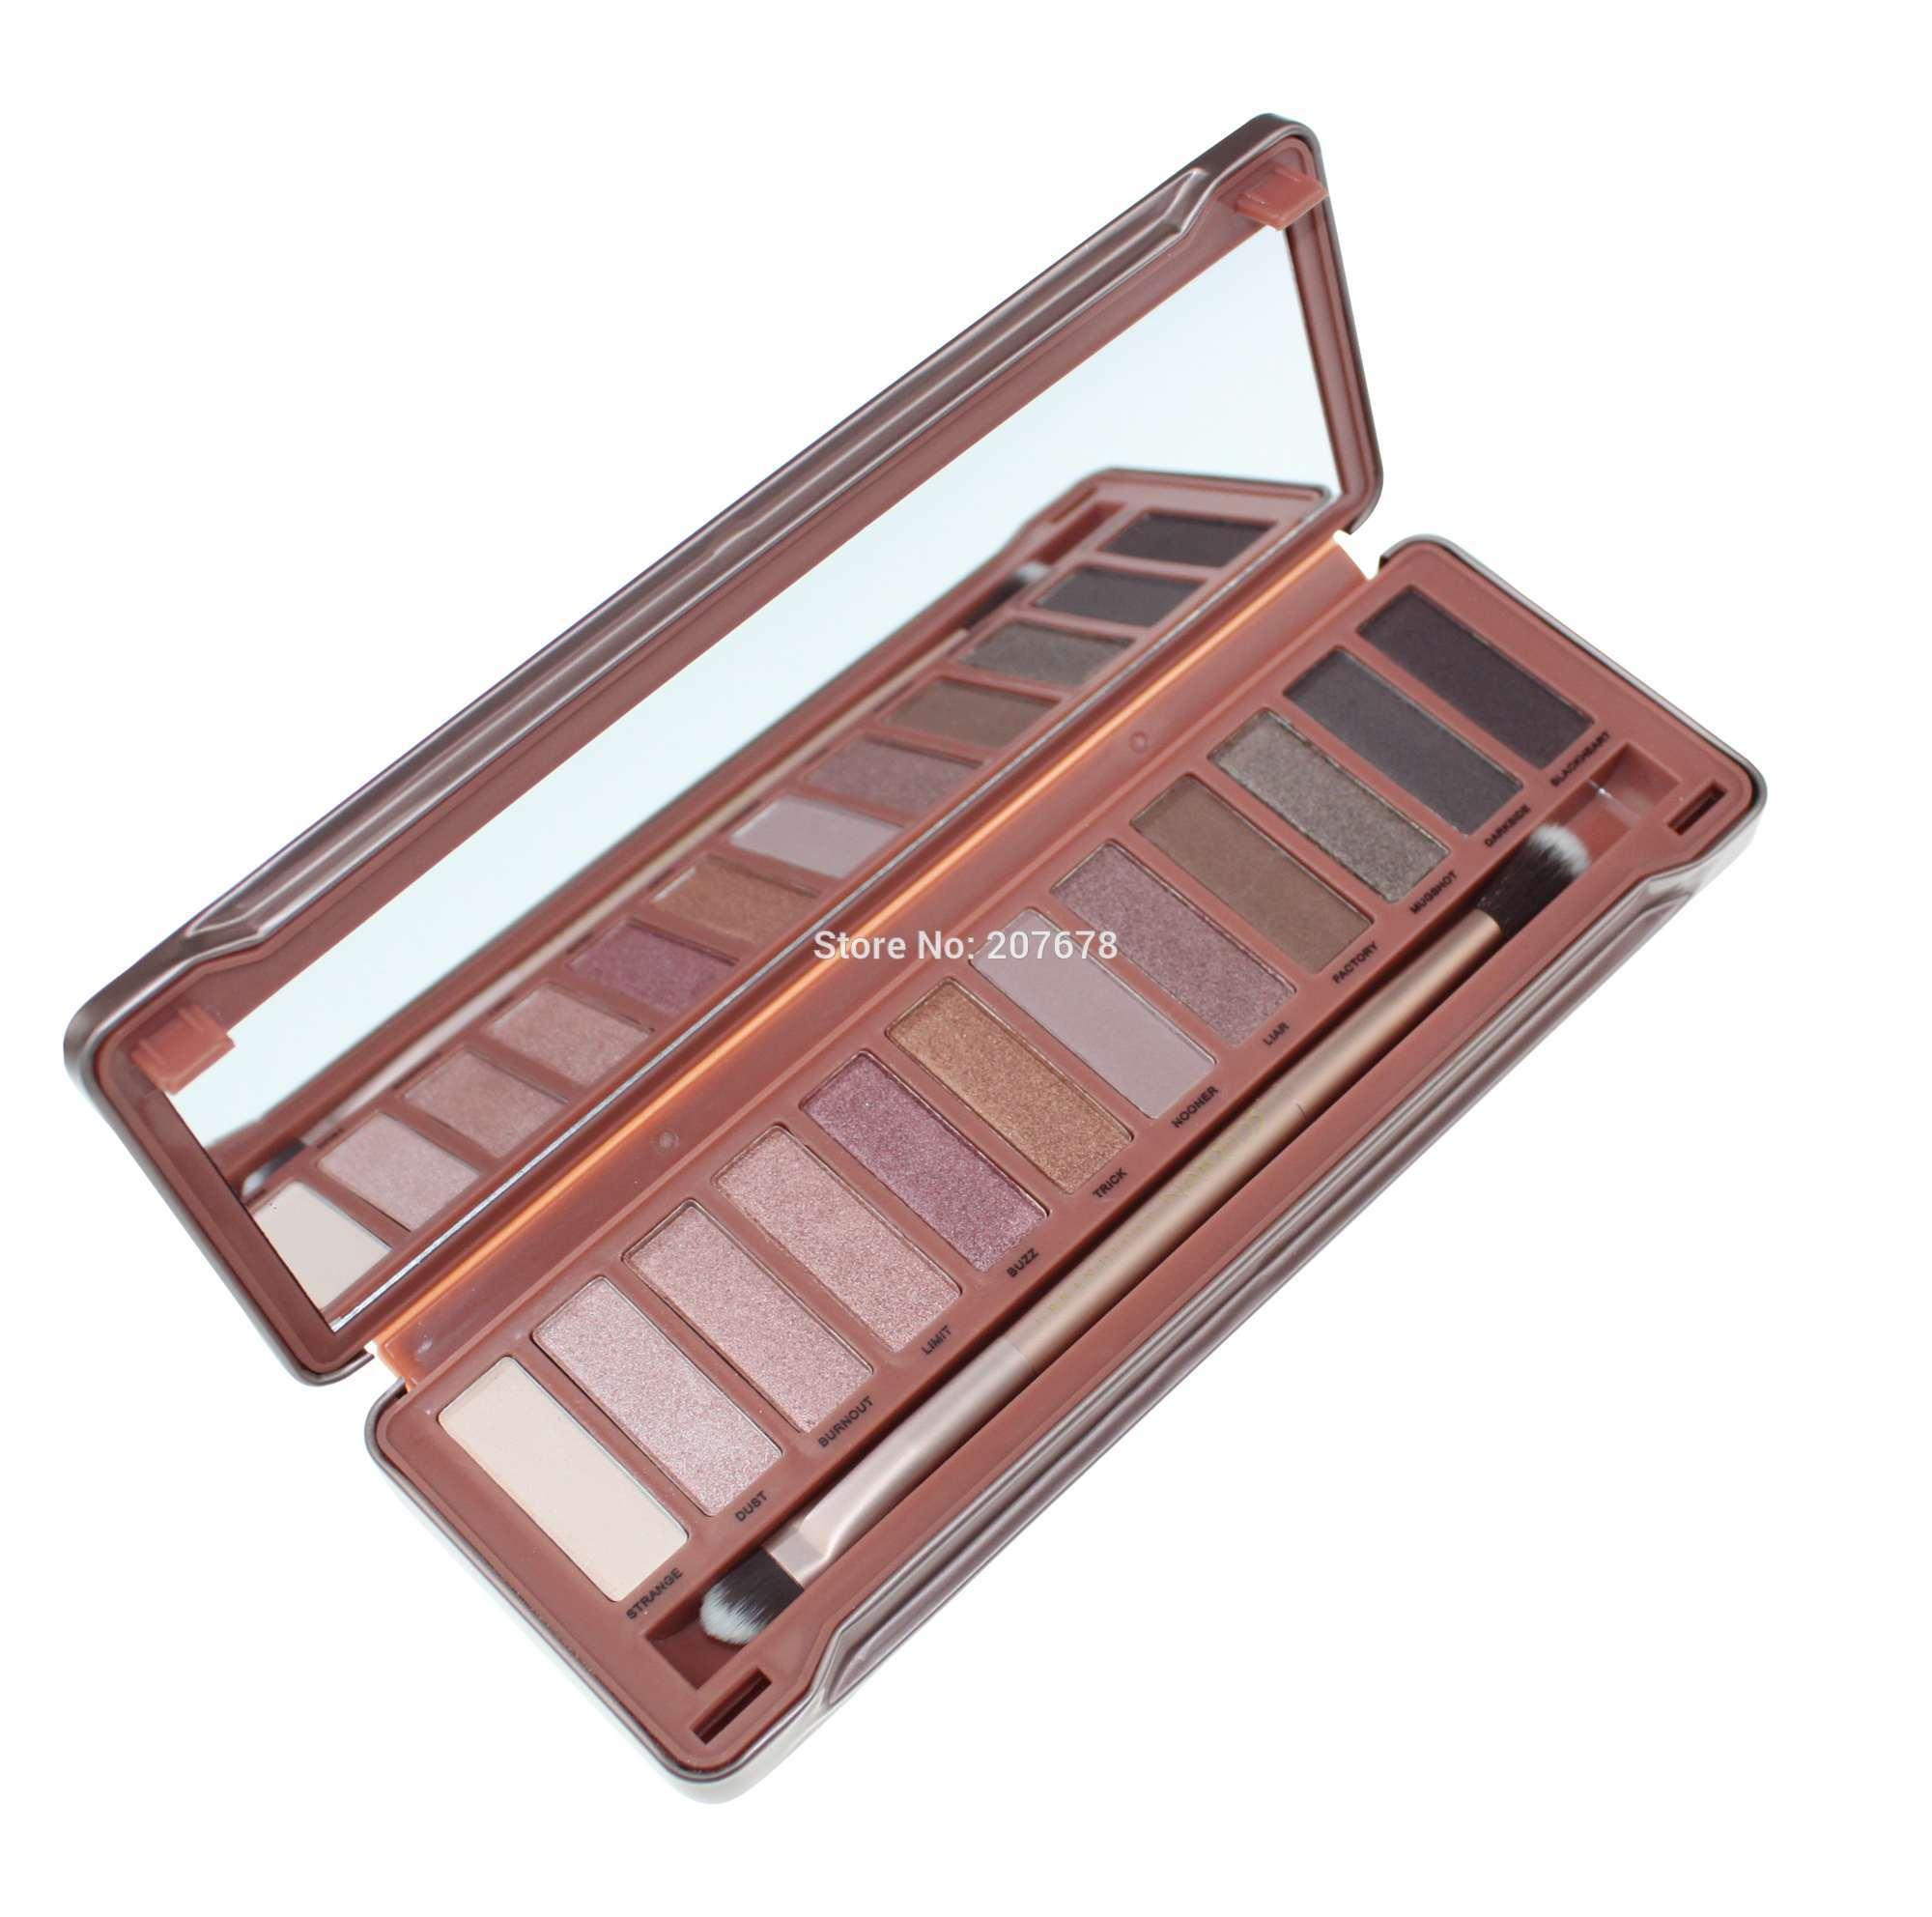 Hot Selling  12 Colors Eye Shadow Makeup Set Naked Eyeshadow Palette gift 3 Generation Free Shipping With Eyeshadow Brush(China (Mainland))